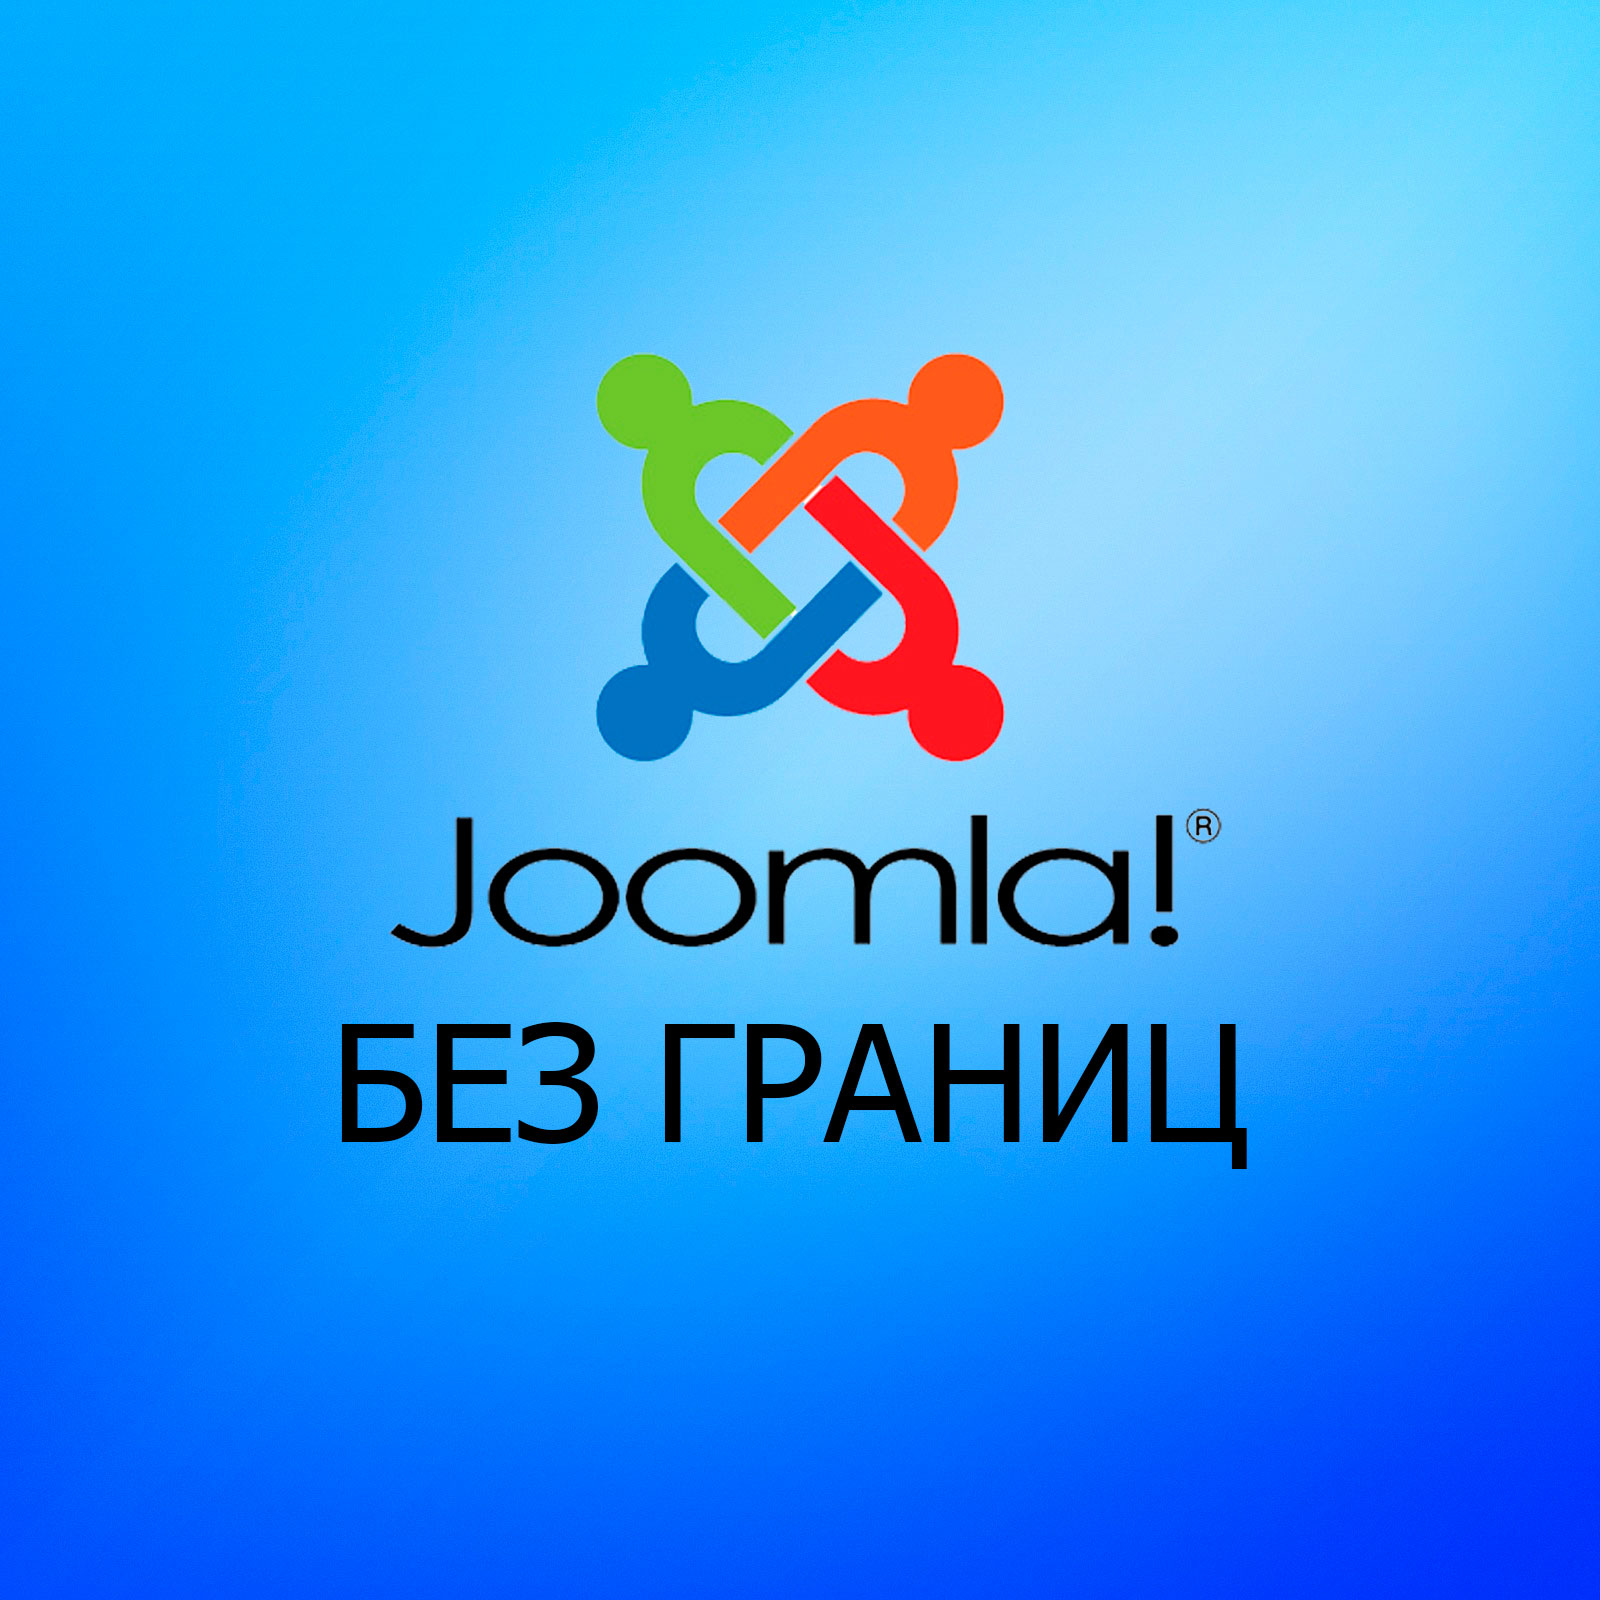 joomla-bez-granic